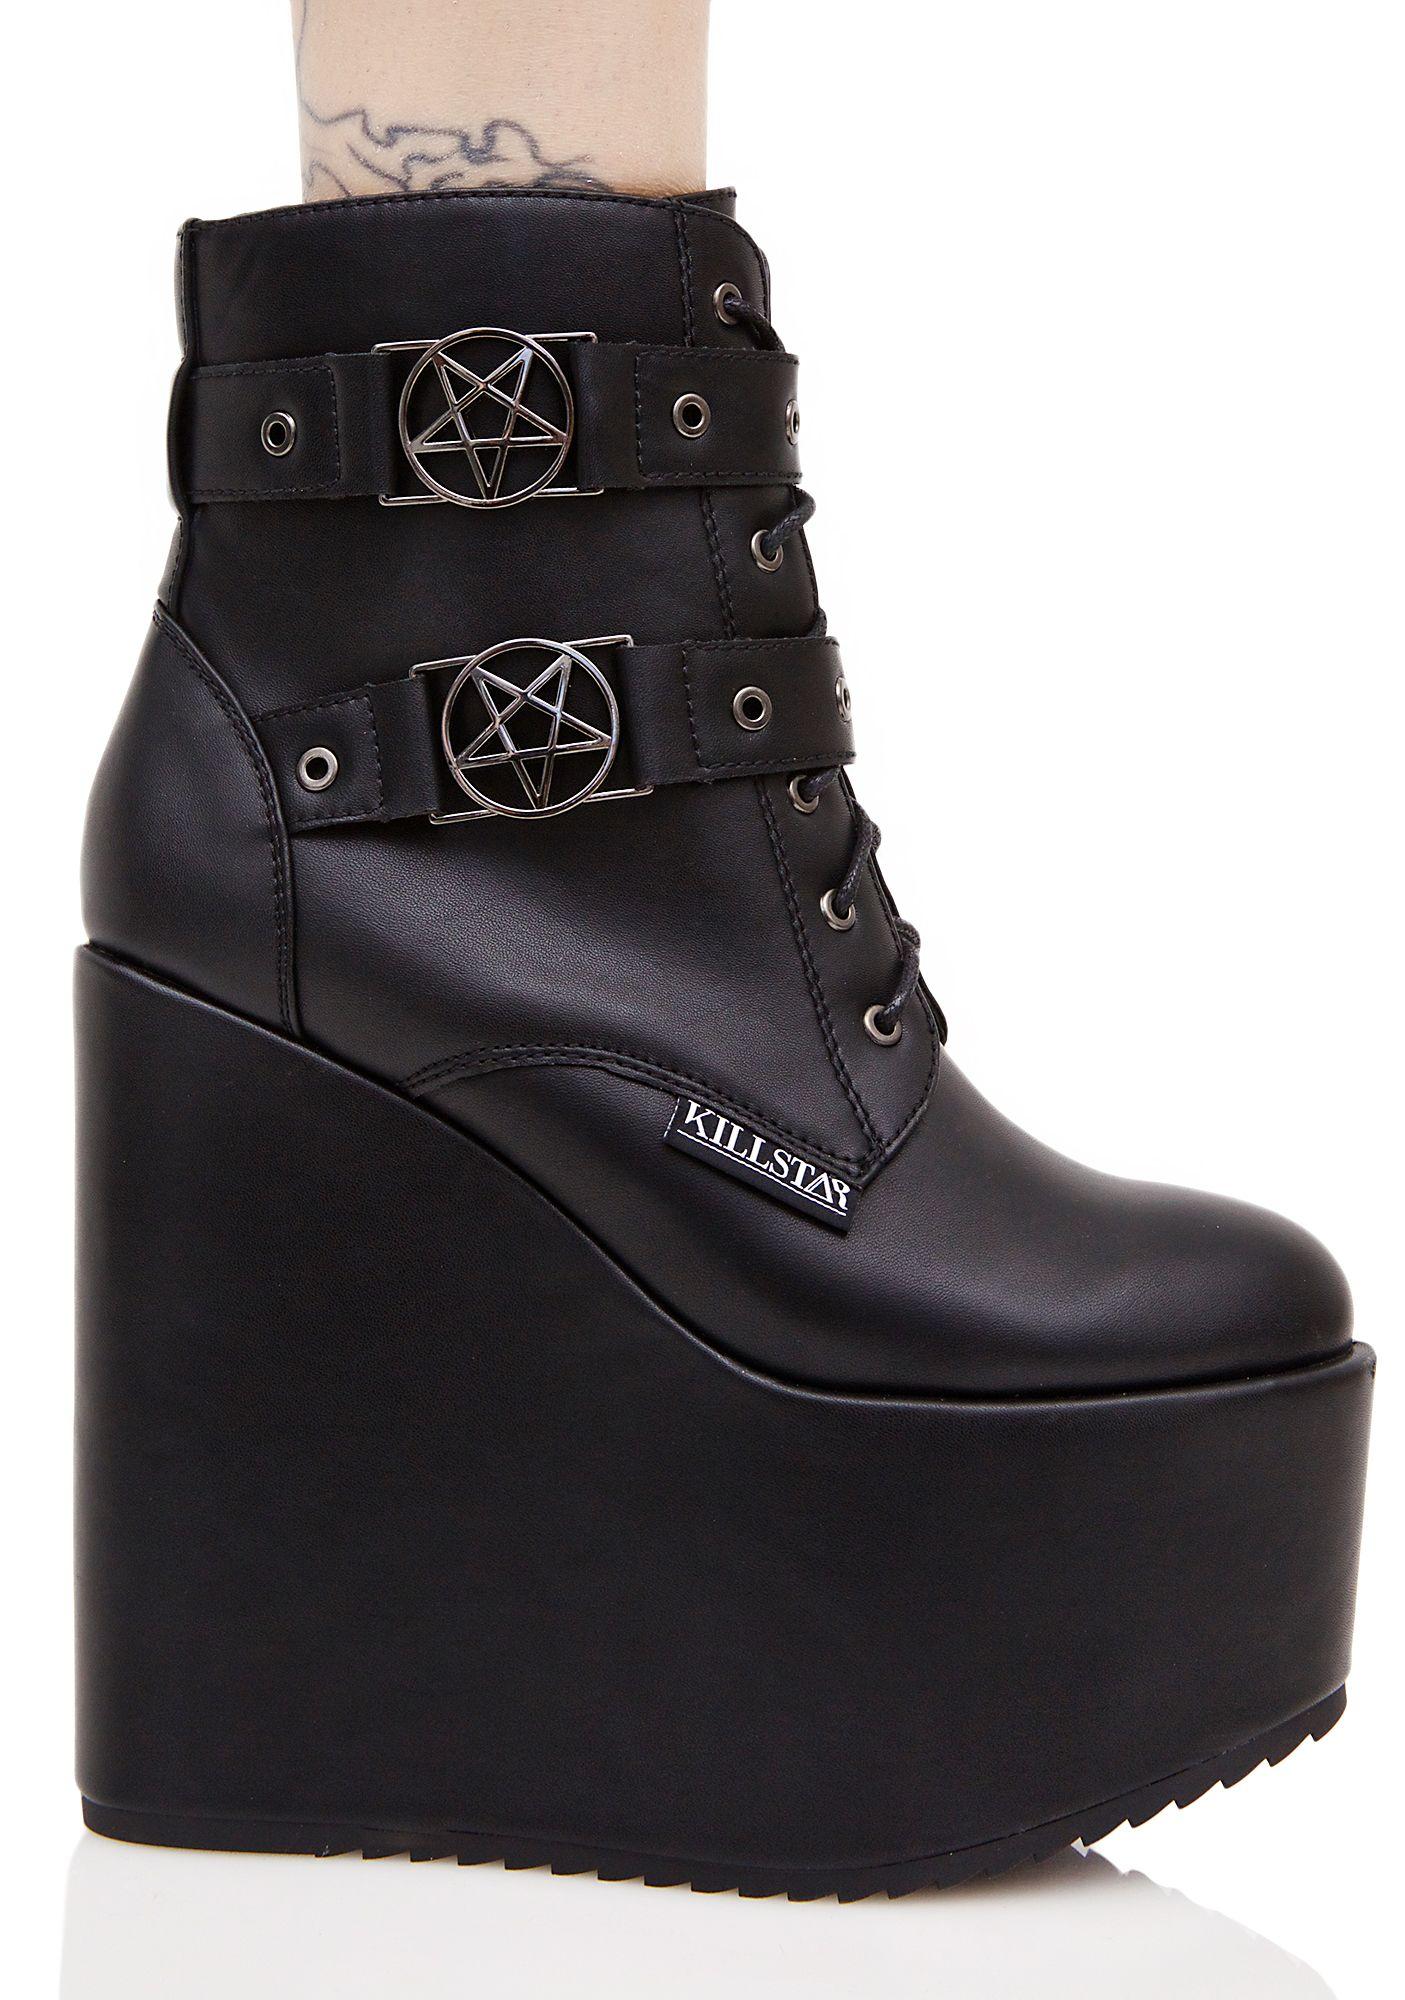 dccf9a80c7b Killstar Sabitha Pentagram Platform Wedge Booties Goth Platform Shoes